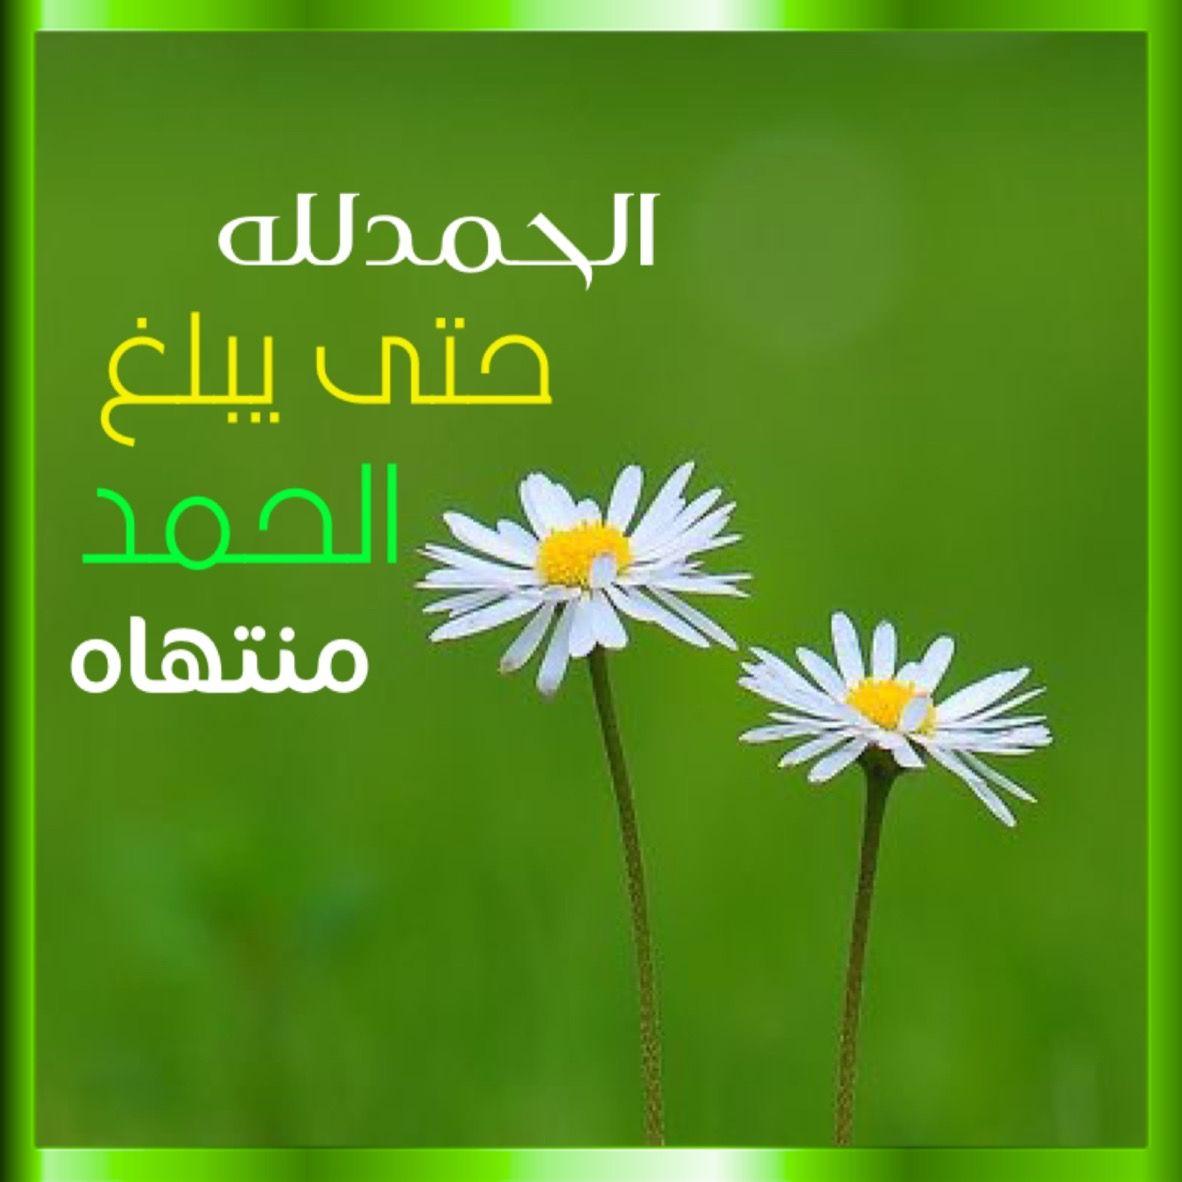 الحمدلله Islamic Pictures Baby Tumblr Islamic Dua